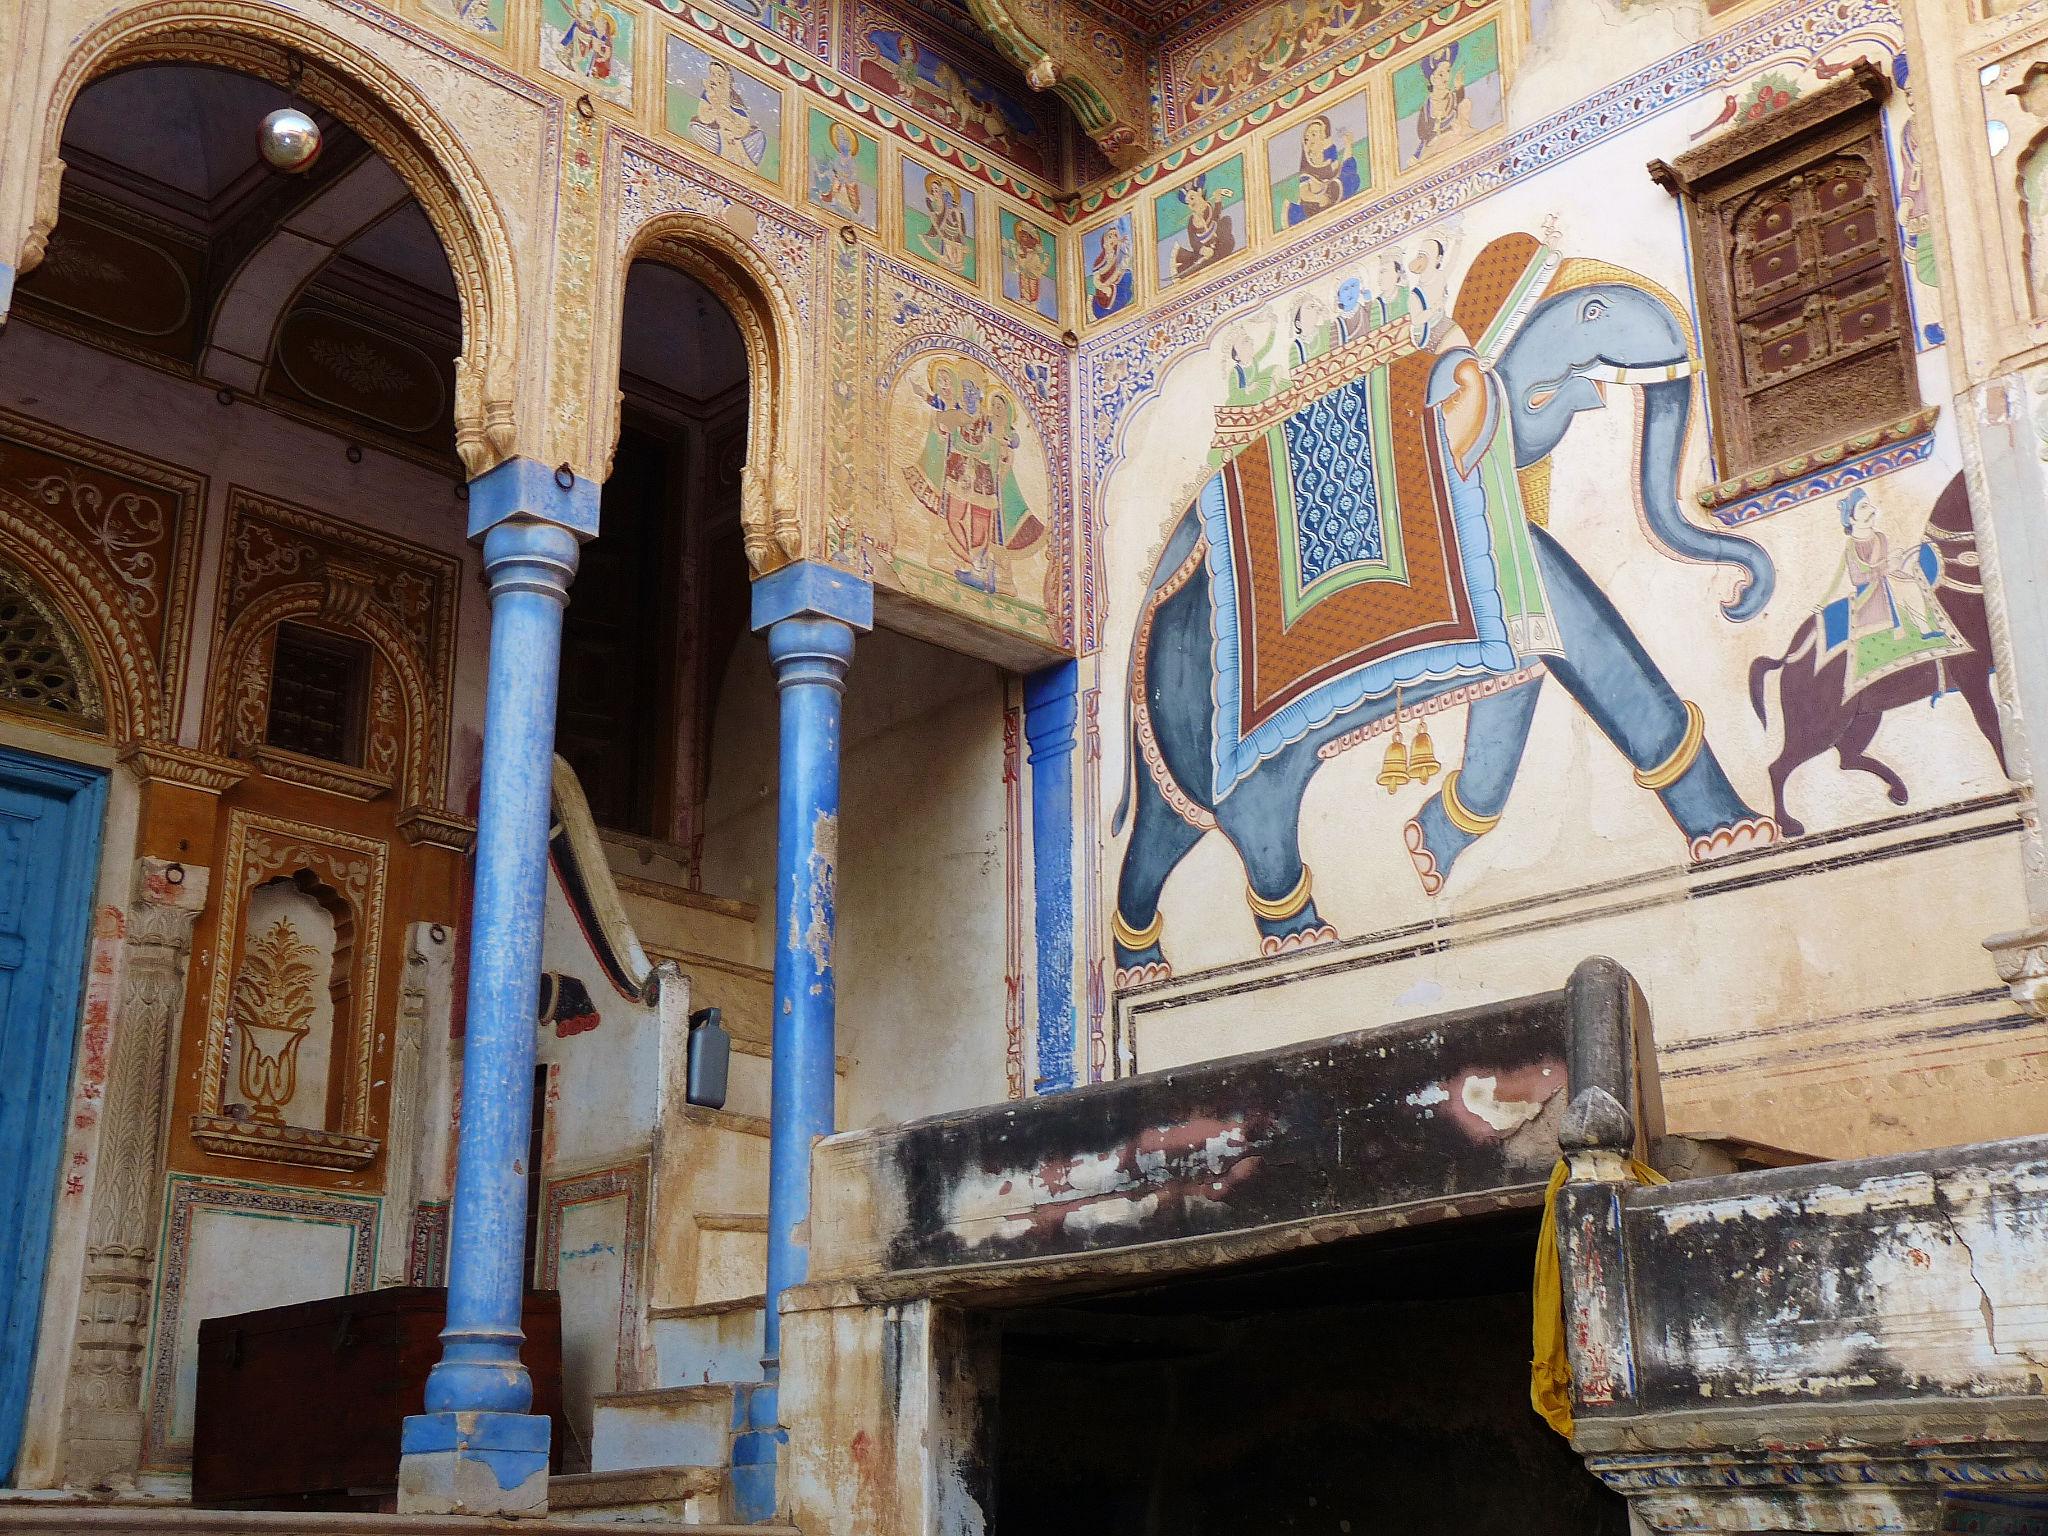 Mandawa India  city photo : ... Indian life in a haveli in Mandawa, Rajasthan, India | A Niche World